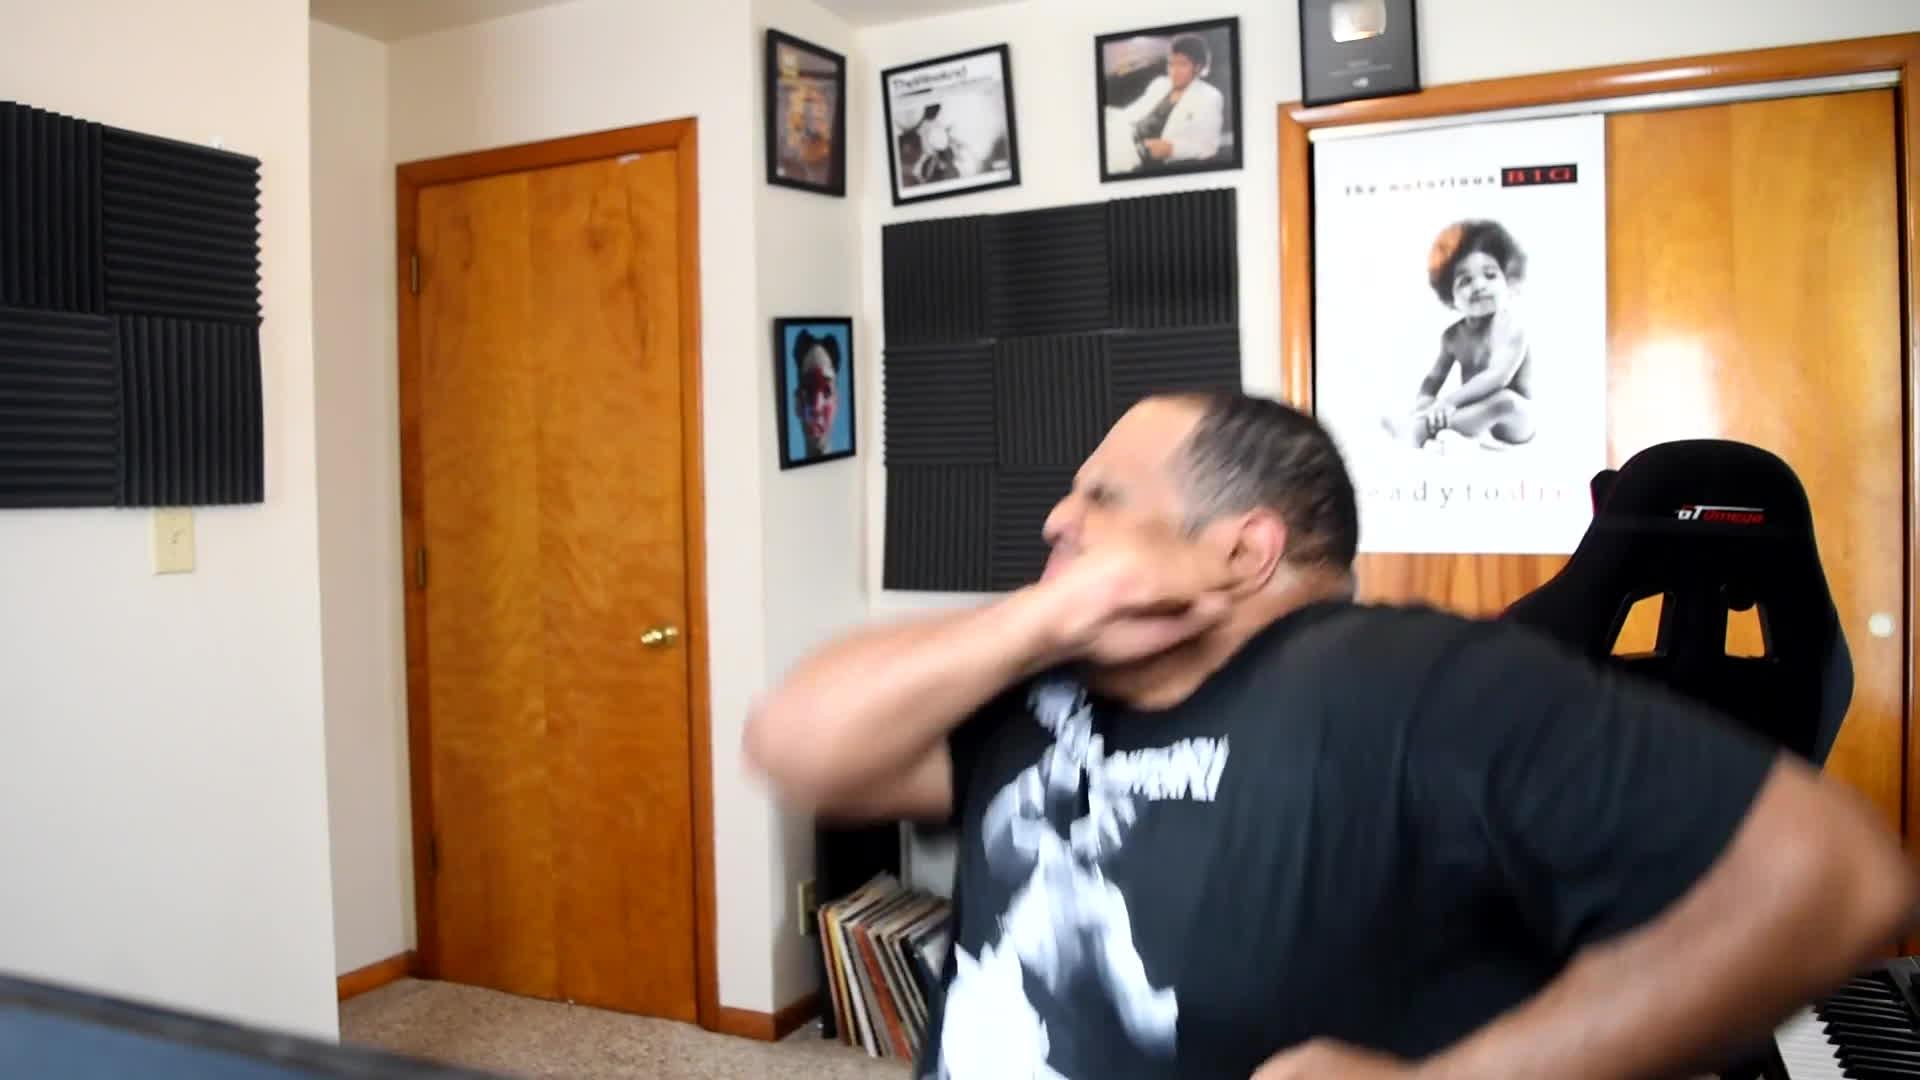 hiphopheads, DAMN First Reaction GIFs